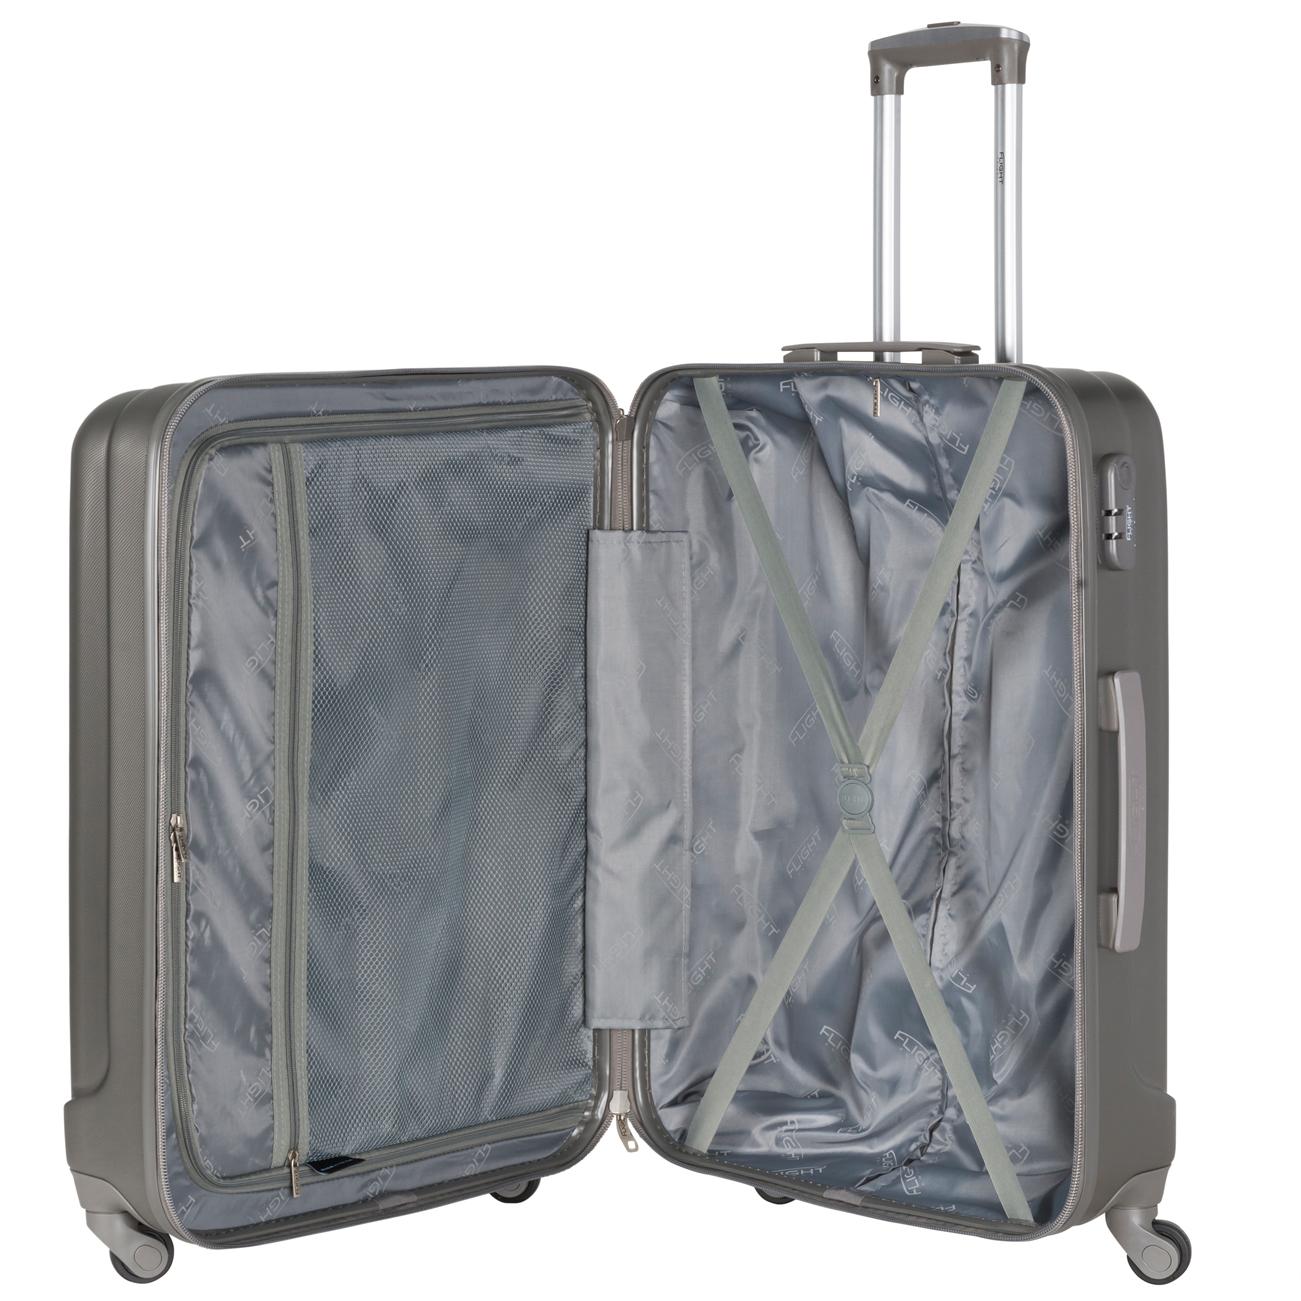 Details about Lightweight Hard Case Cabin Carry On Suitcase Bag Sets Max  Size Virgin Atlantic